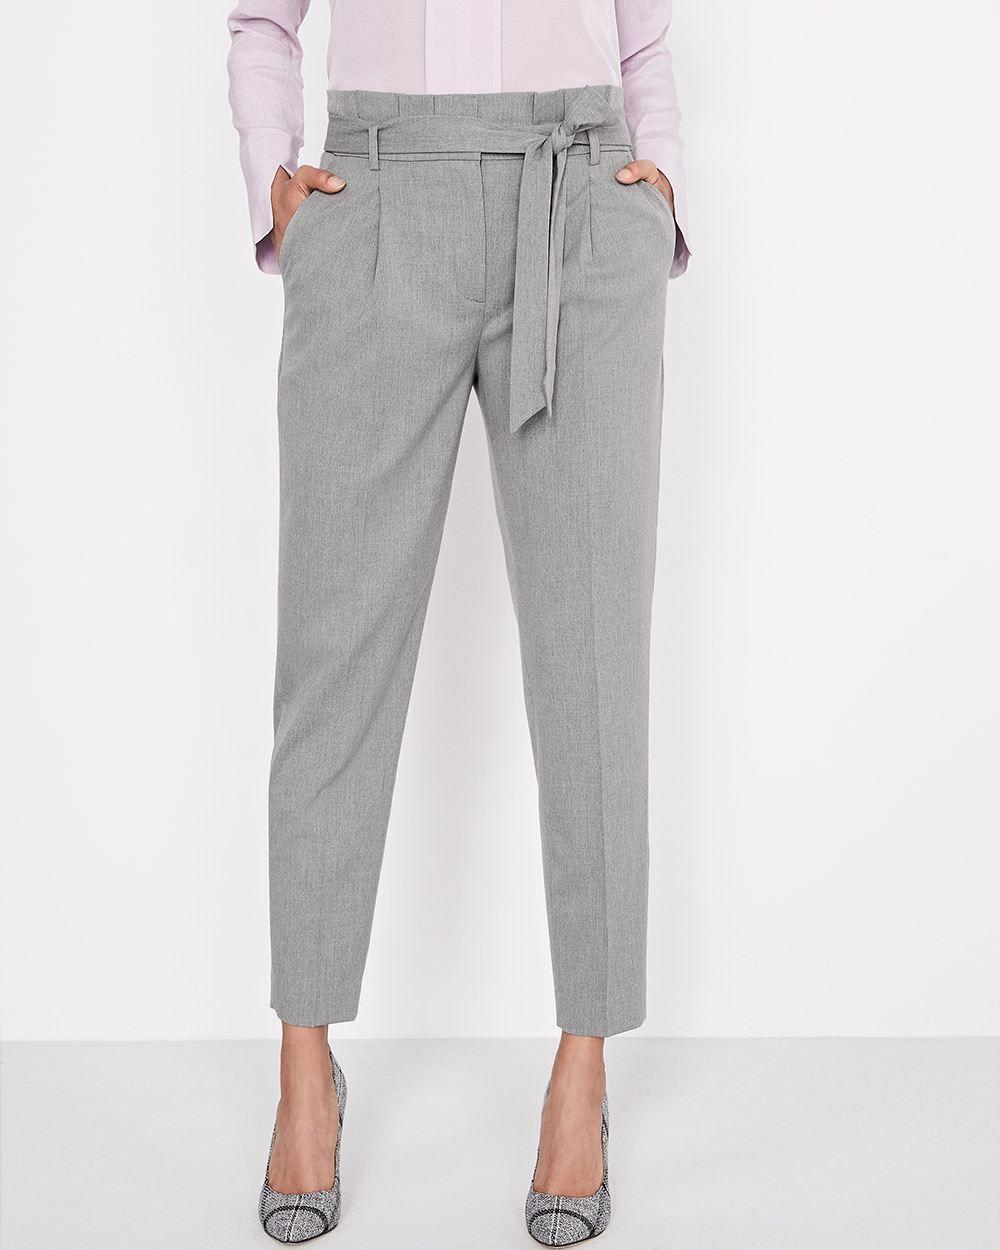 0de7944abc These pants have a stylish paper-bag waist that looks super-polished ...